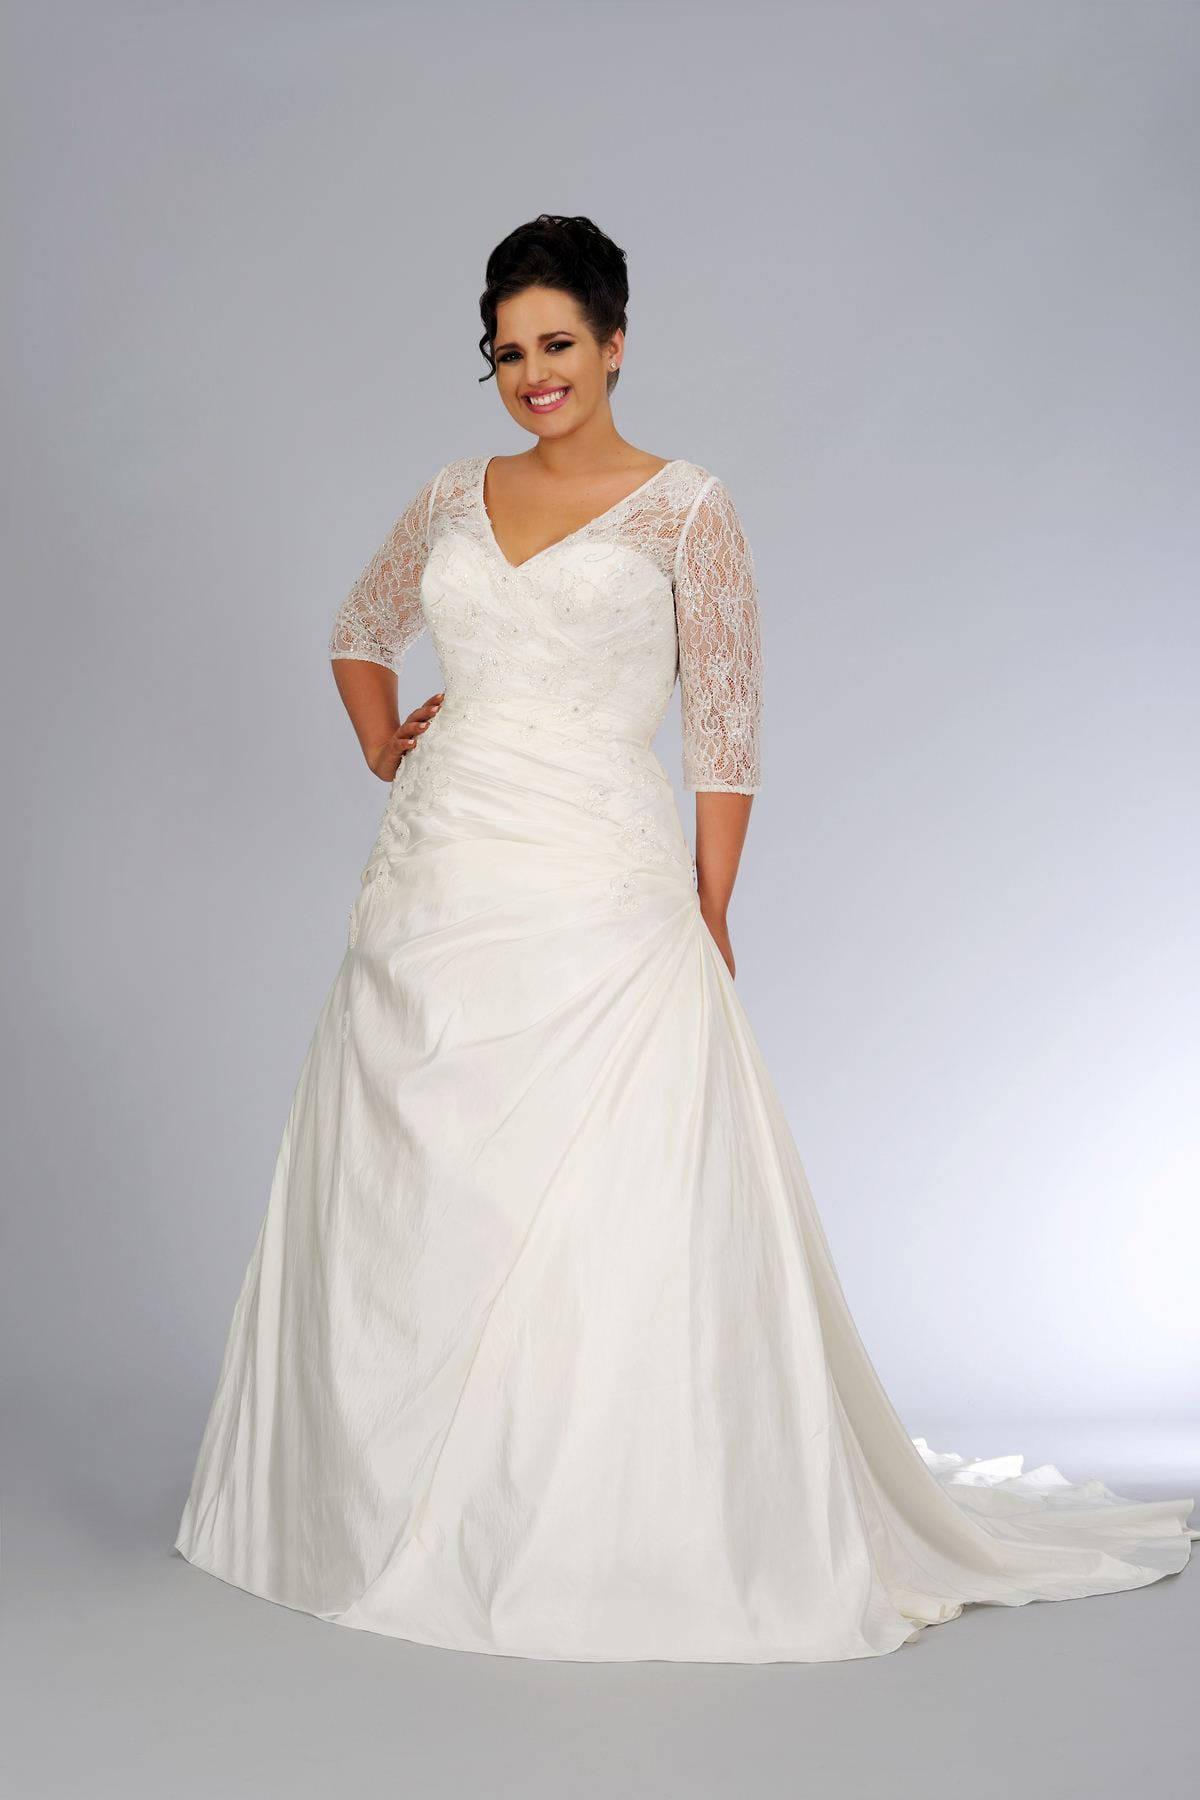 Plus Size 3/4 sleeve wedding gown by Darius Bridal